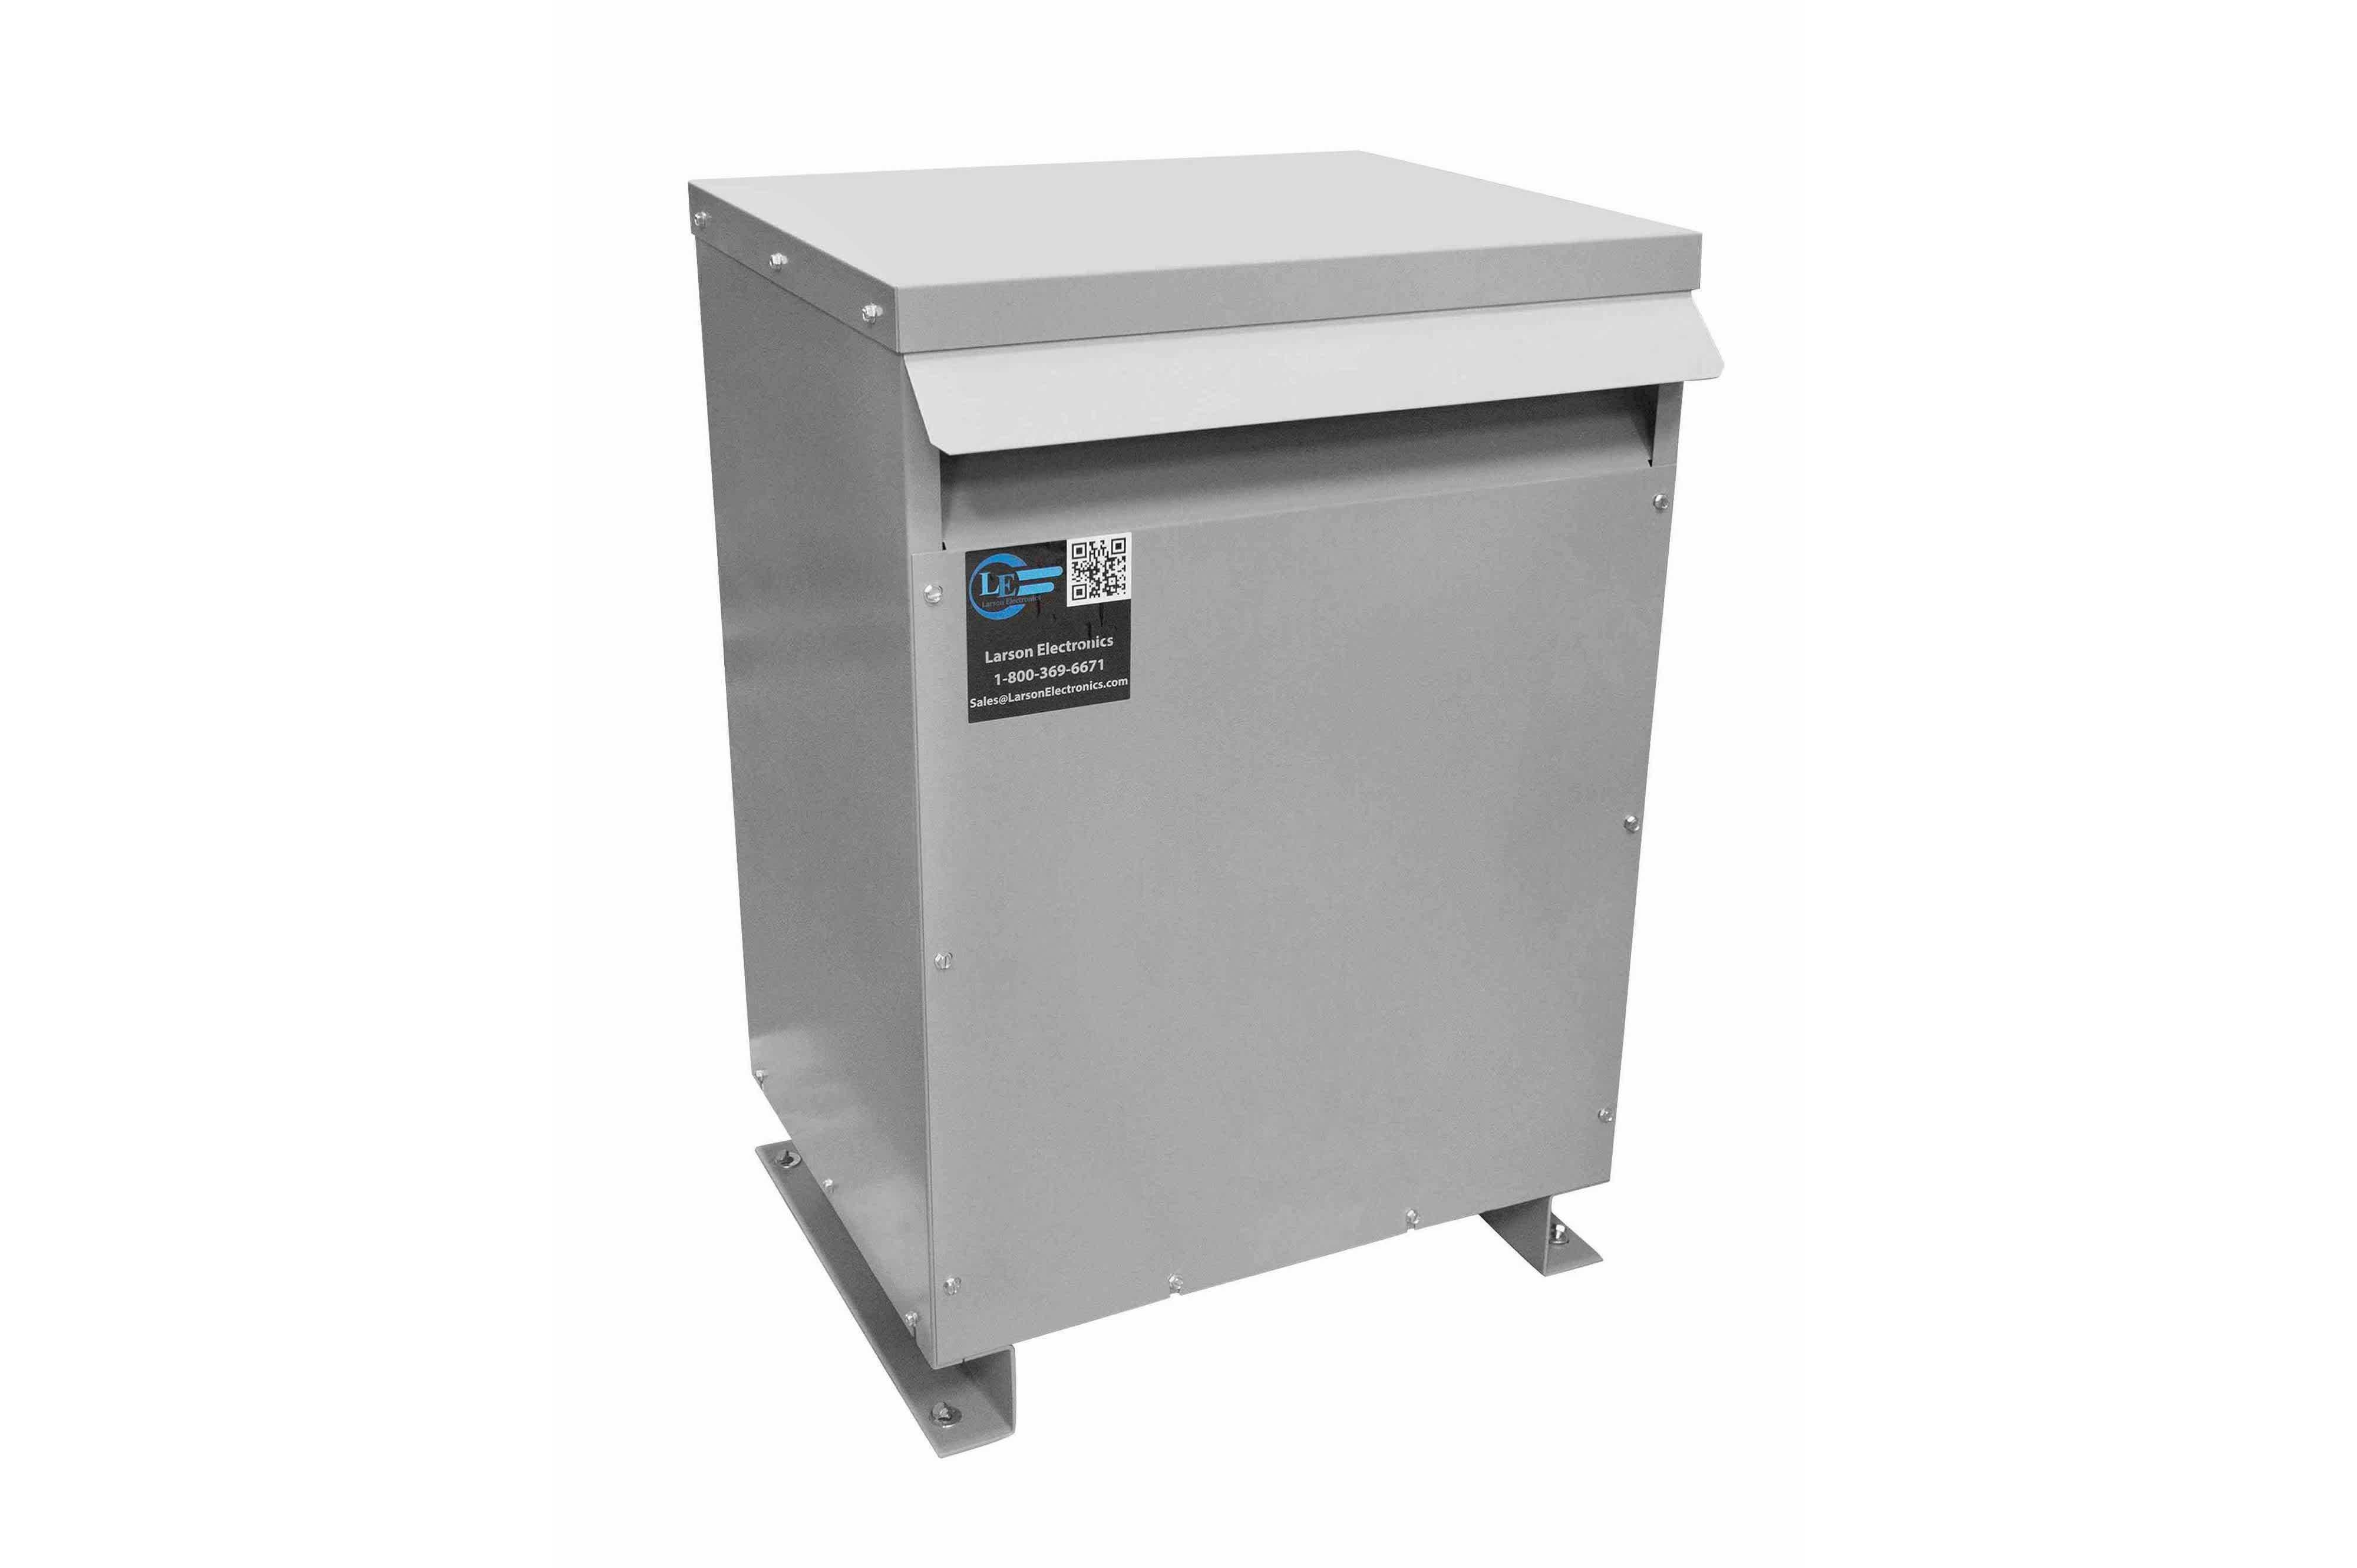 28 kVA 3PH Isolation Transformer, 600V Wye Primary, 400V Delta Secondary, N3R, Ventilated, 60 Hz